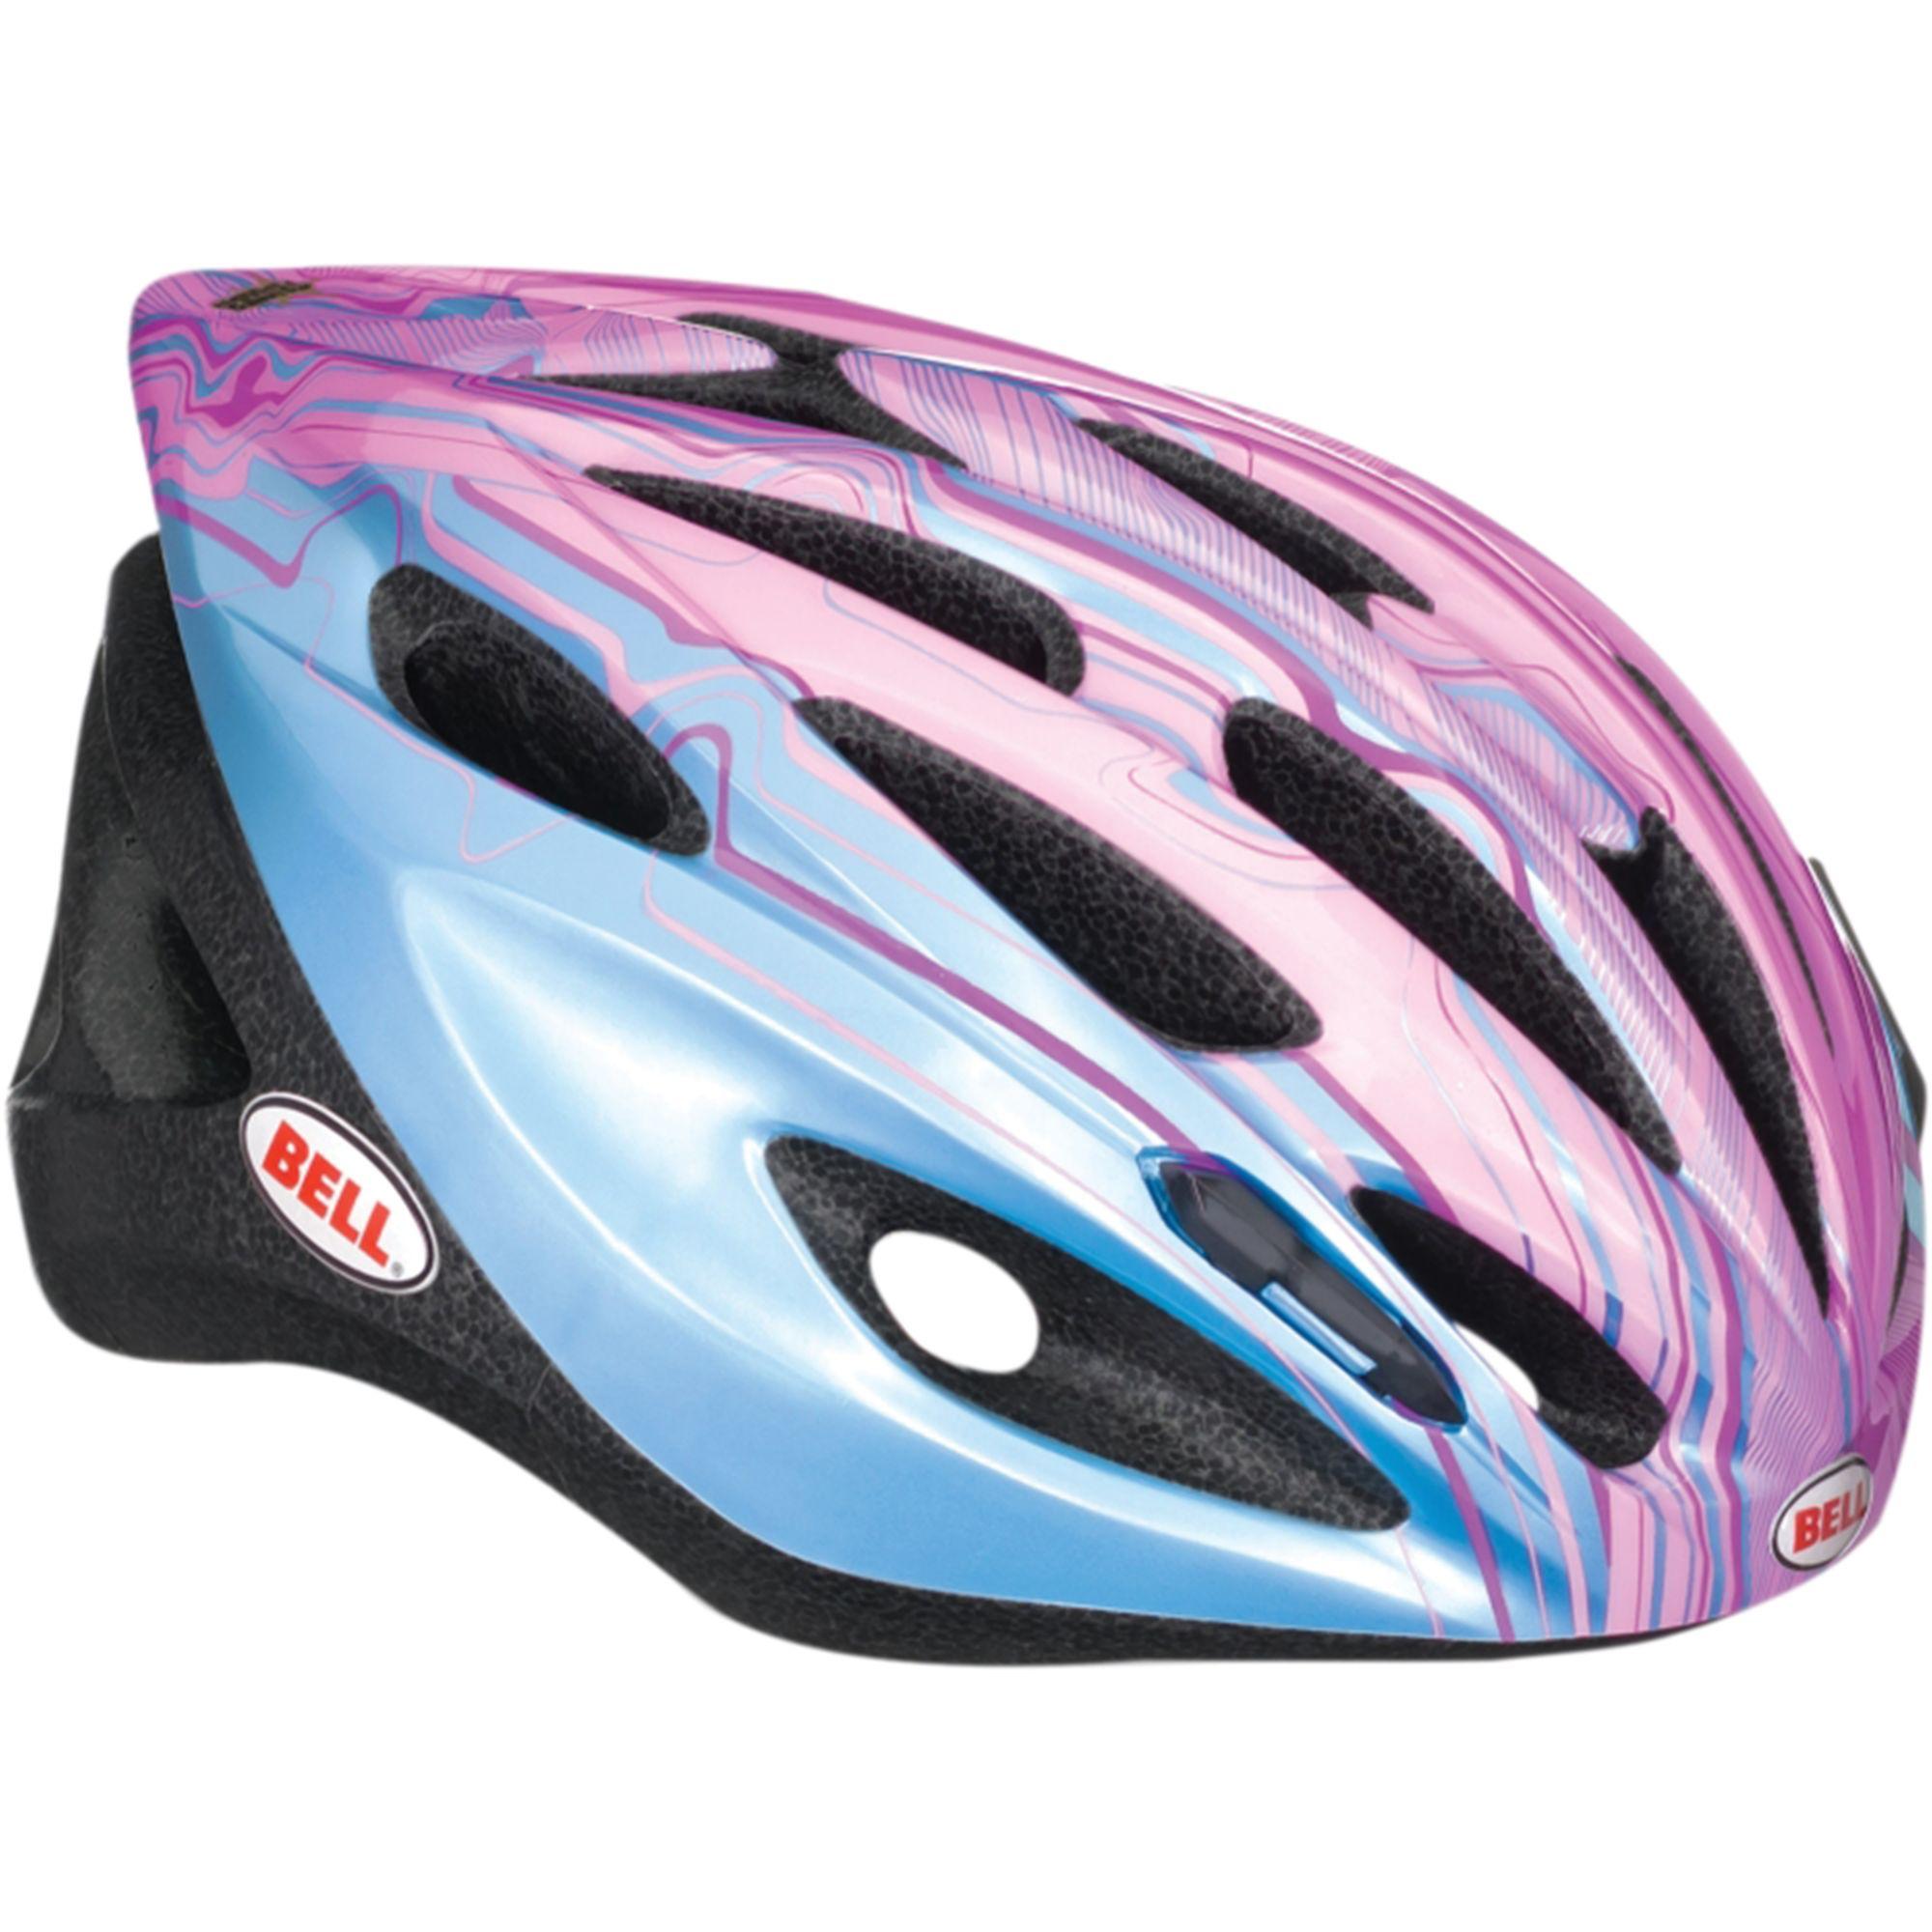 Kids Bike Helmets Dick S Sporting Goods